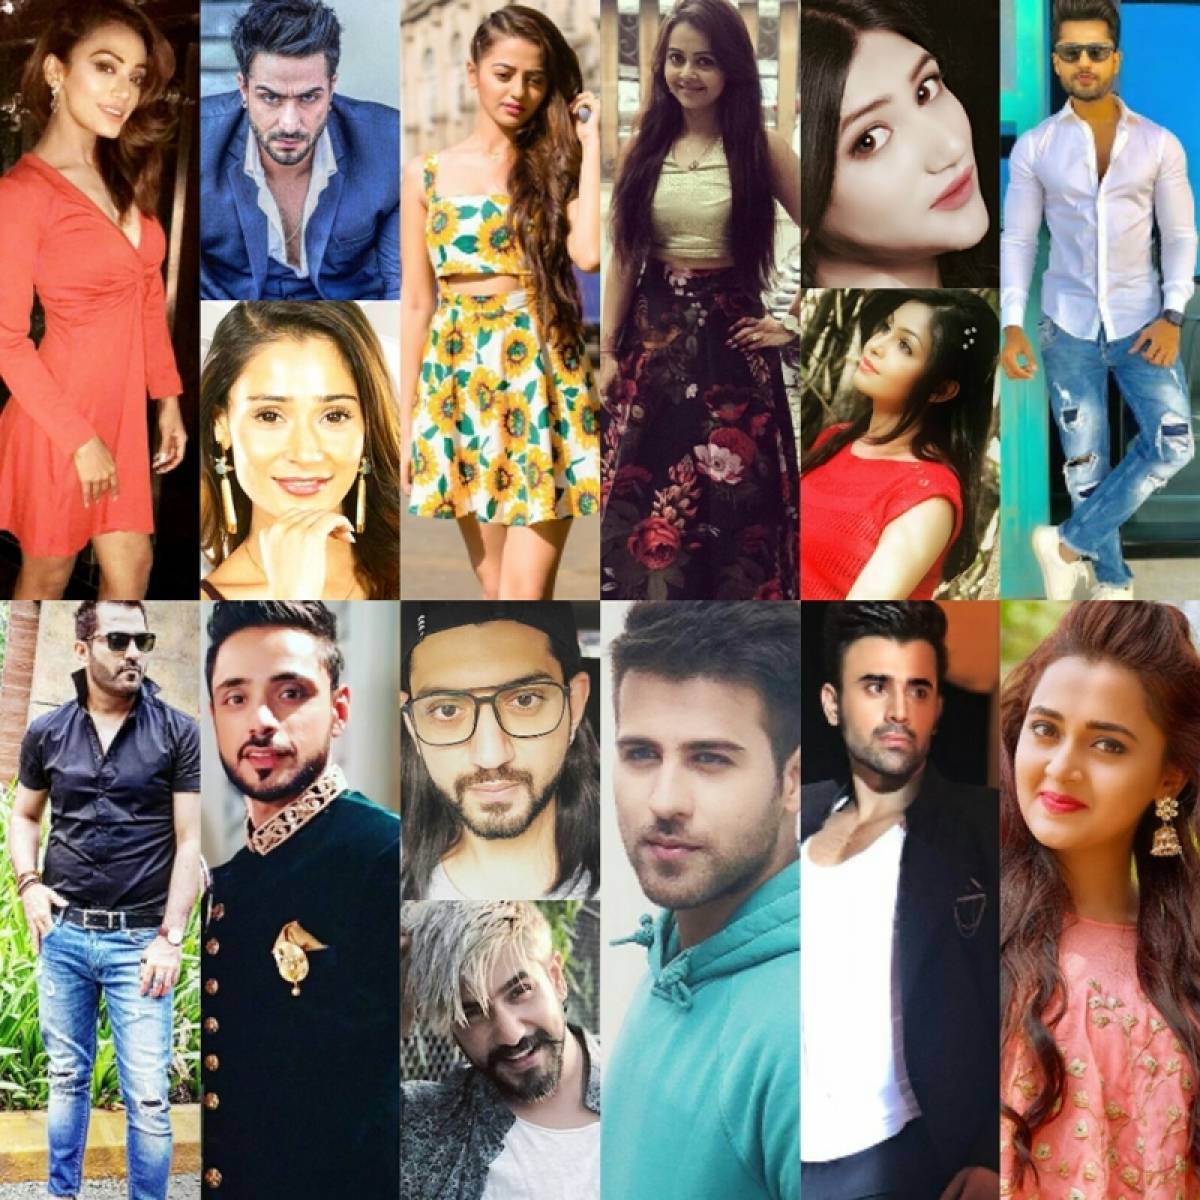 Eid-ul-Fitr 2018: From Pearl V Puri to Tejasswi Prakash, TV celebs wish 'brotherhood and happiness' on festival eve